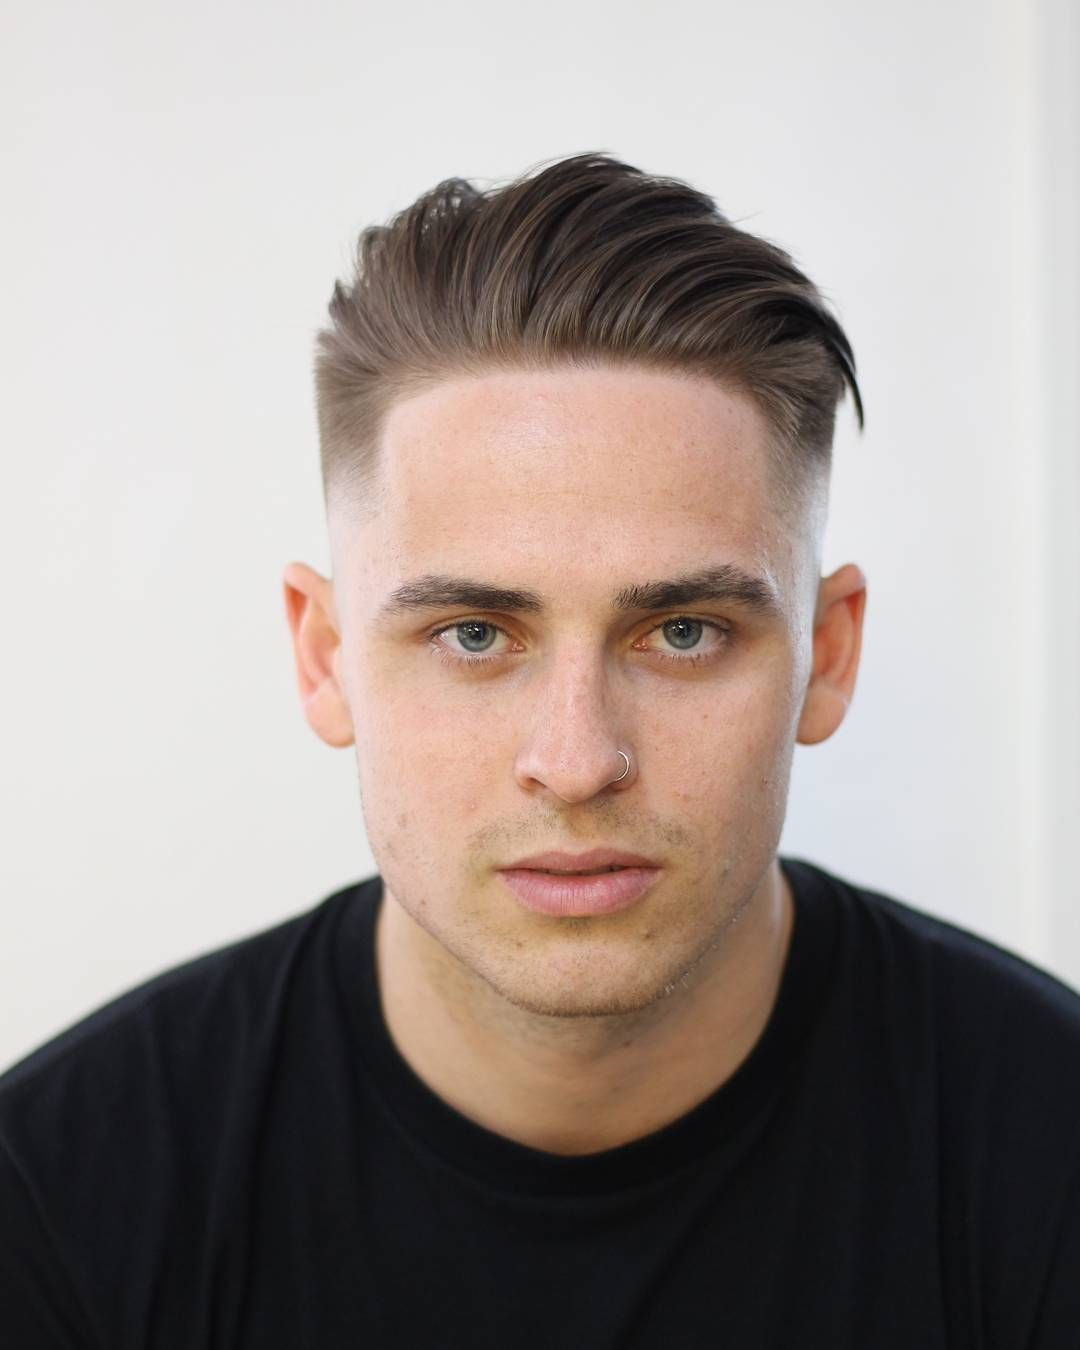 100 New Men S Hairstyles Top Picks Mens Haircuts Short New Men Hairstyles Long Hair Styles Men